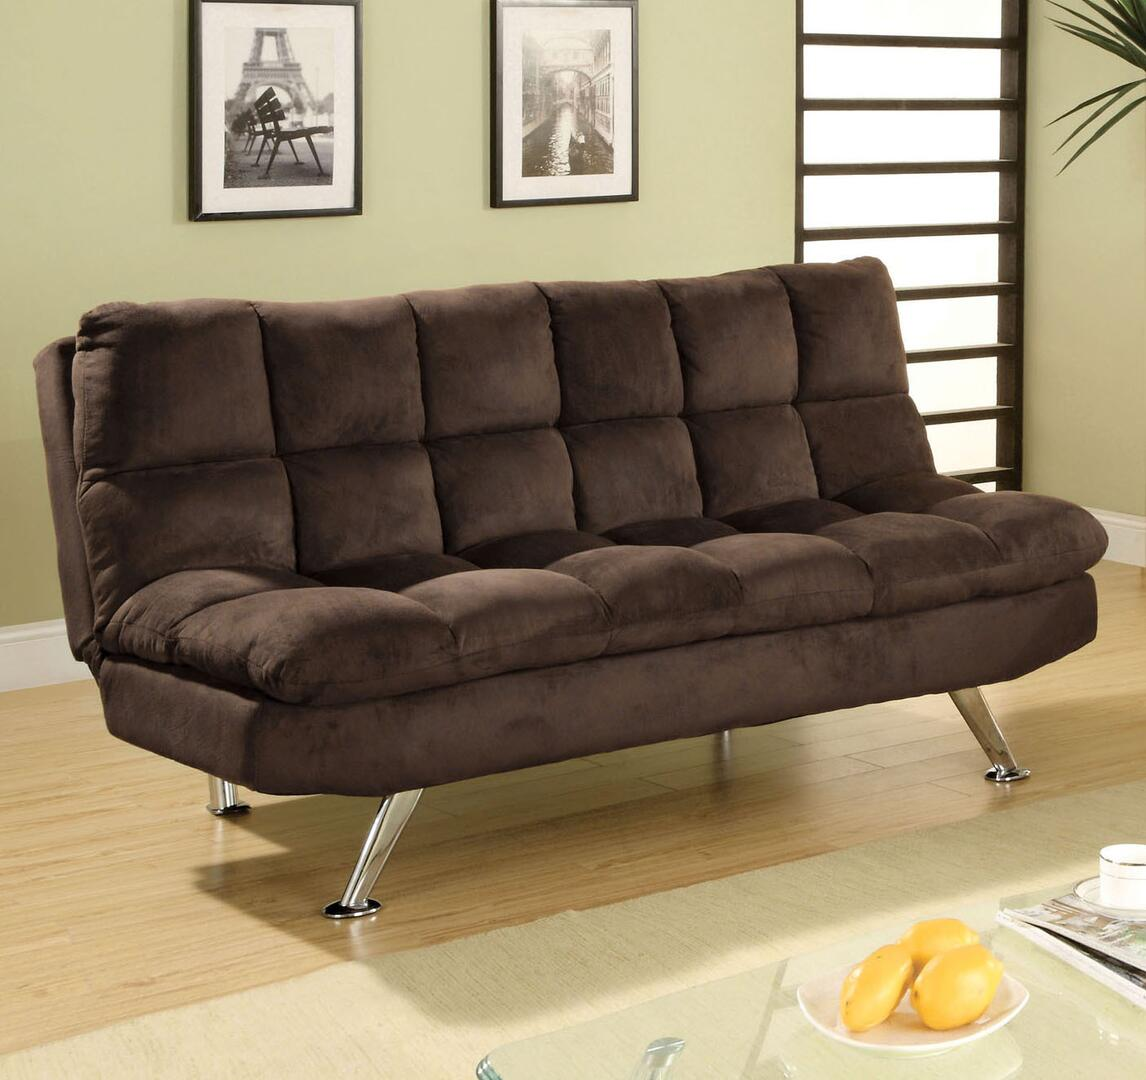 Miraculous Furniture Of America Cm2905 Theyellowbook Wood Chair Design Ideas Theyellowbookinfo